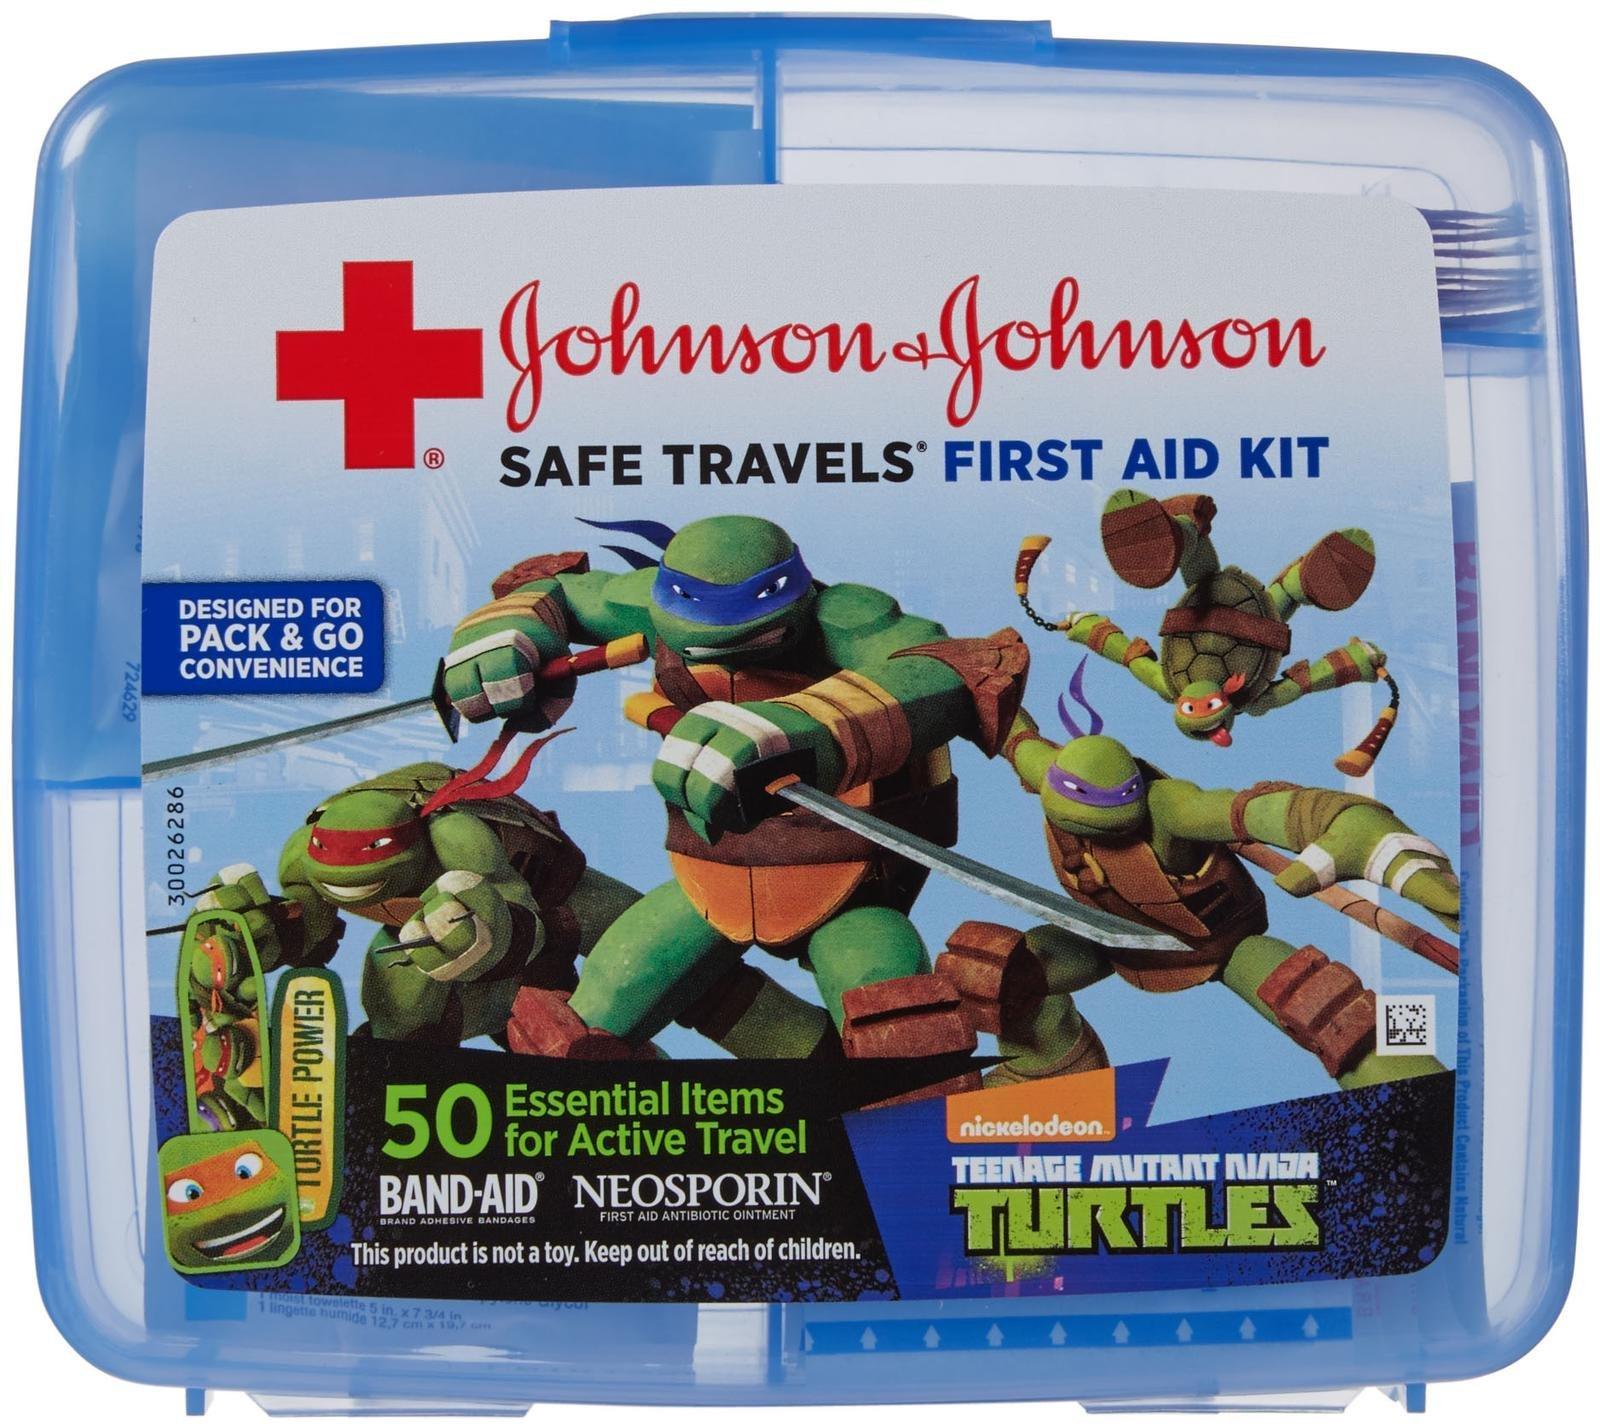 Johnson & Johnson Red Cross SAFE TRAVELS First Aid Kit-Teenage Mutant Ninja Turtles-50 ct